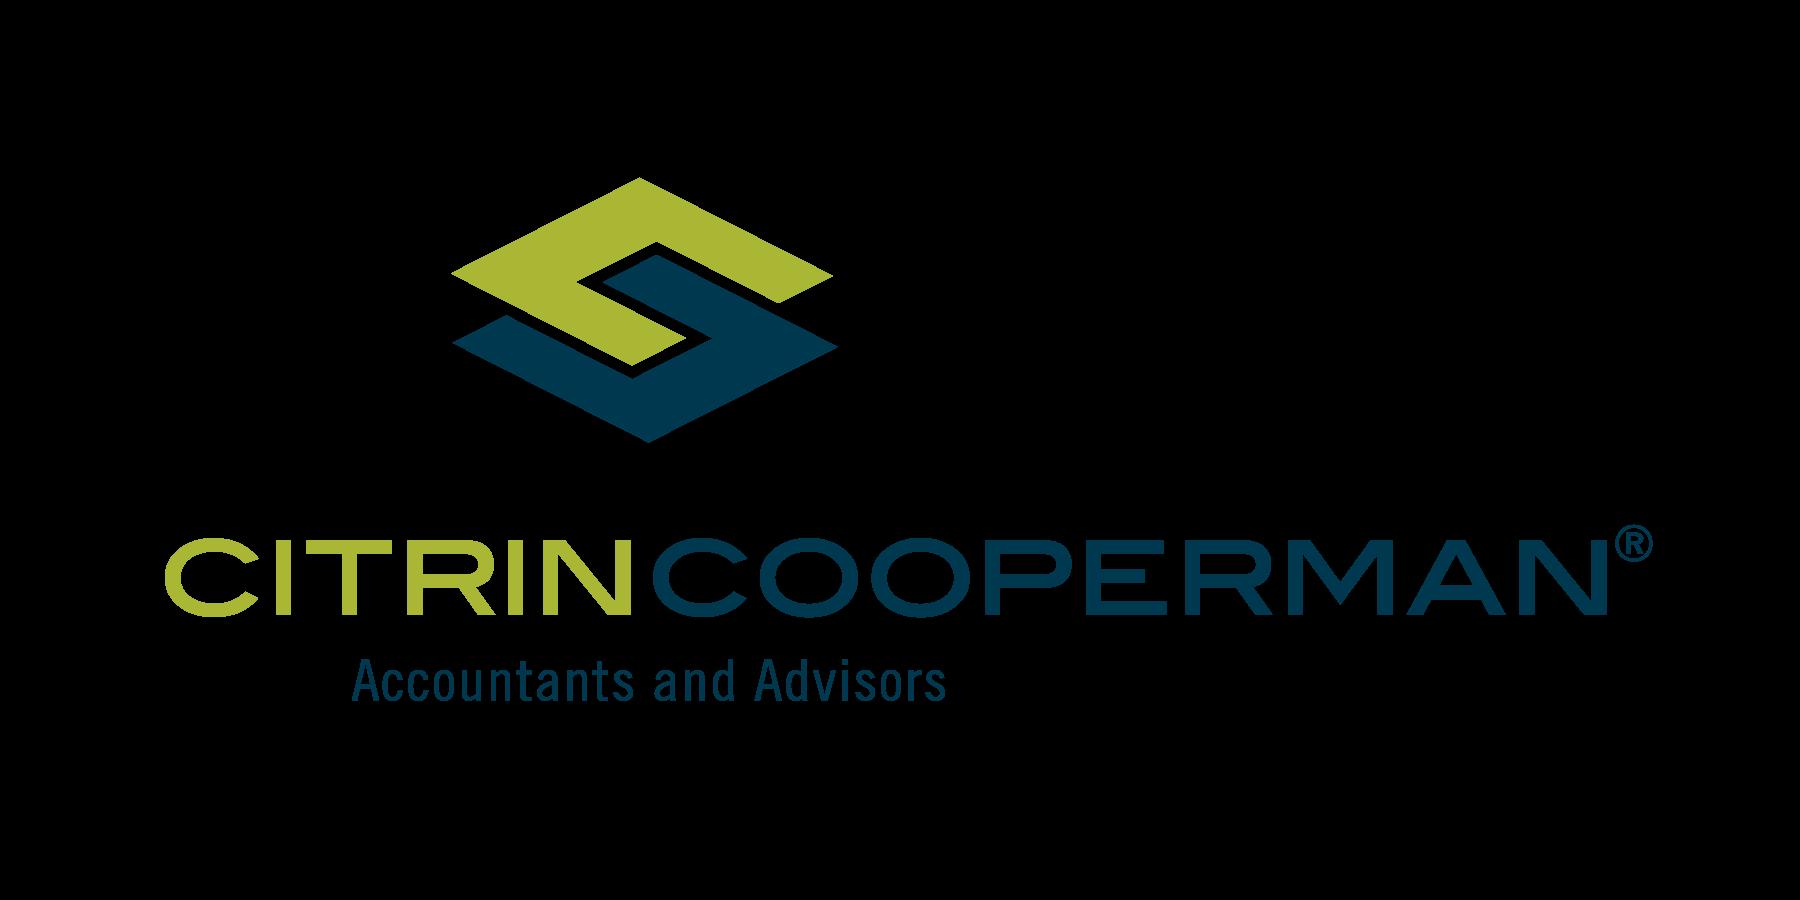 Citrin Cooperman Logo